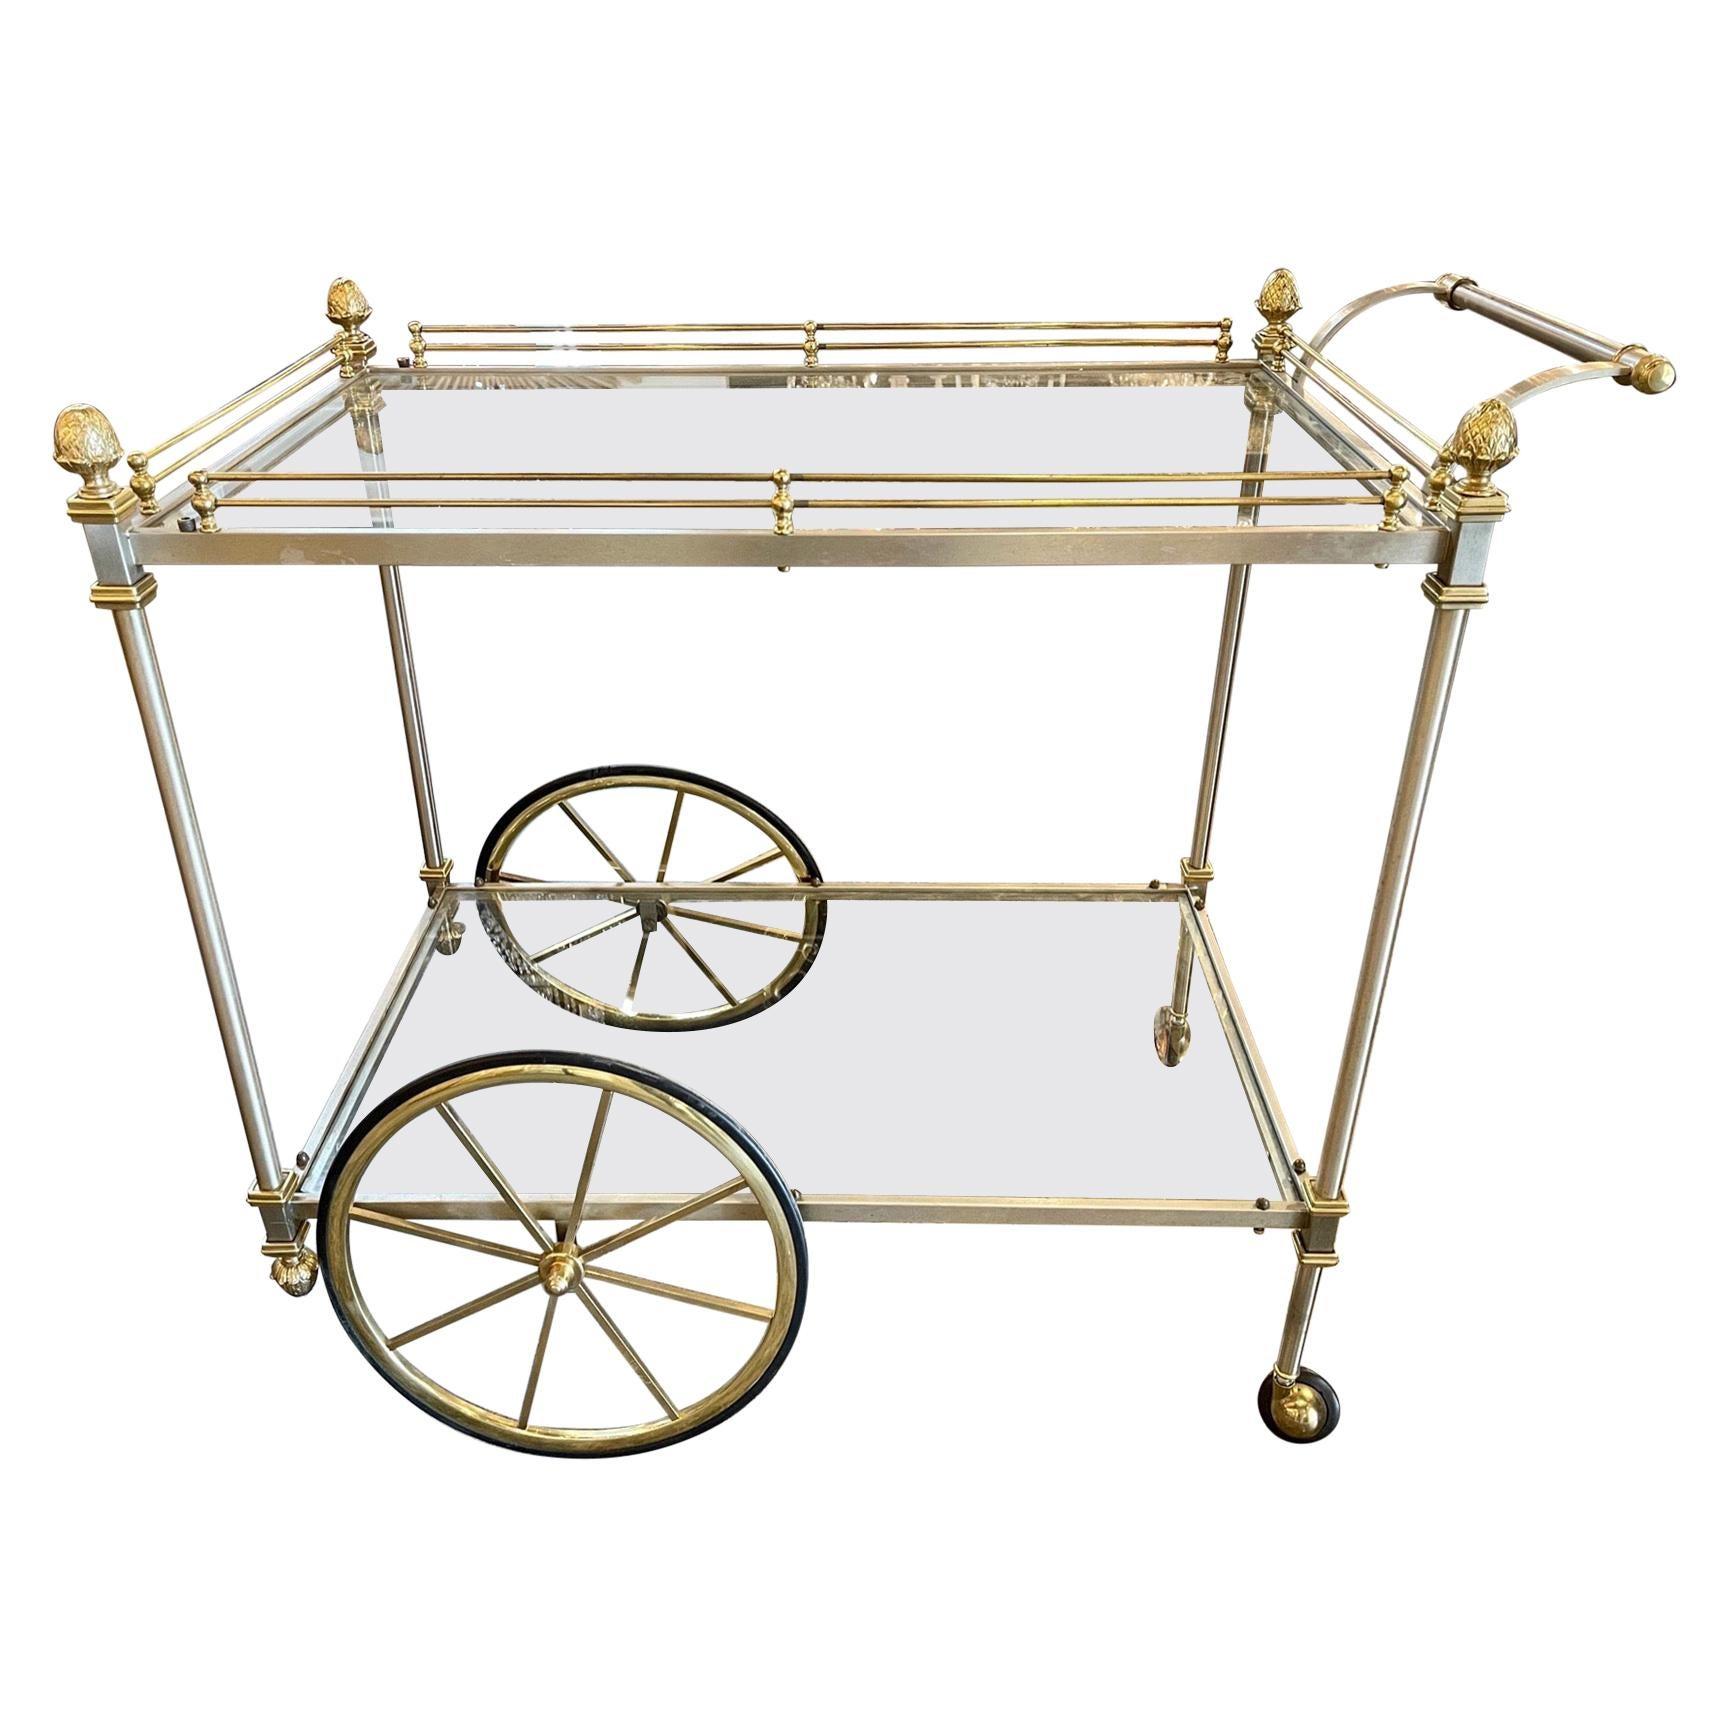 Vintage Italian Steel and Brass Bar Cart